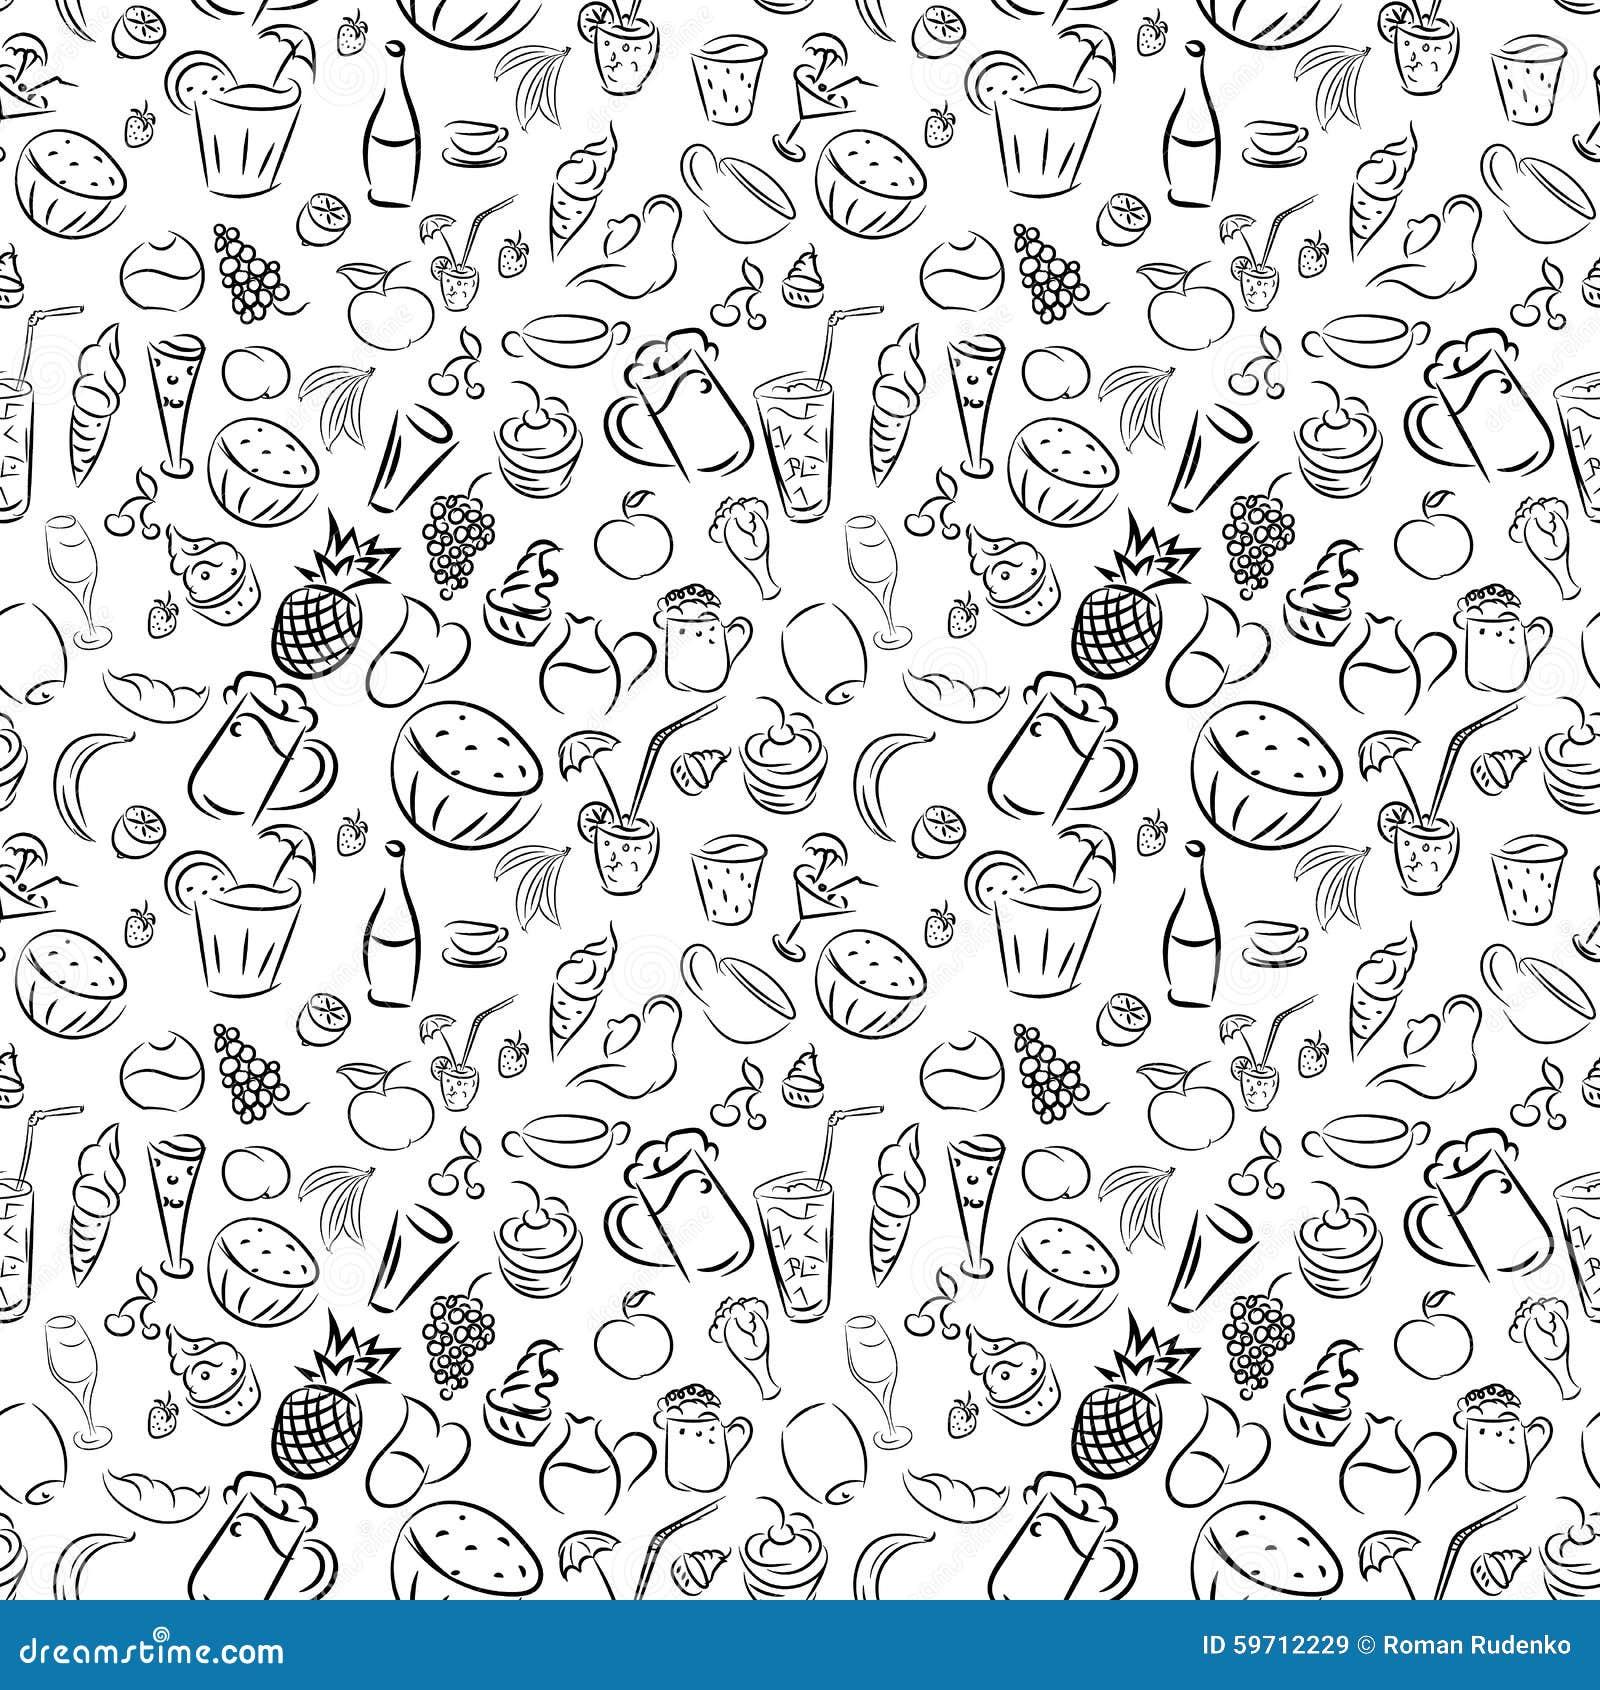 Cartoon Satellite Illustration Graphic 398036 further Stock Images Wedding Love Doodle Image29068784 additionally Stock Illustration Hammerhead Shark Tattoo Illustration Hideous White Background Image67876999 also Stock Photography Calculator Printer Vector Illustration Image1622022 also Namaste 3496903. on black people resources